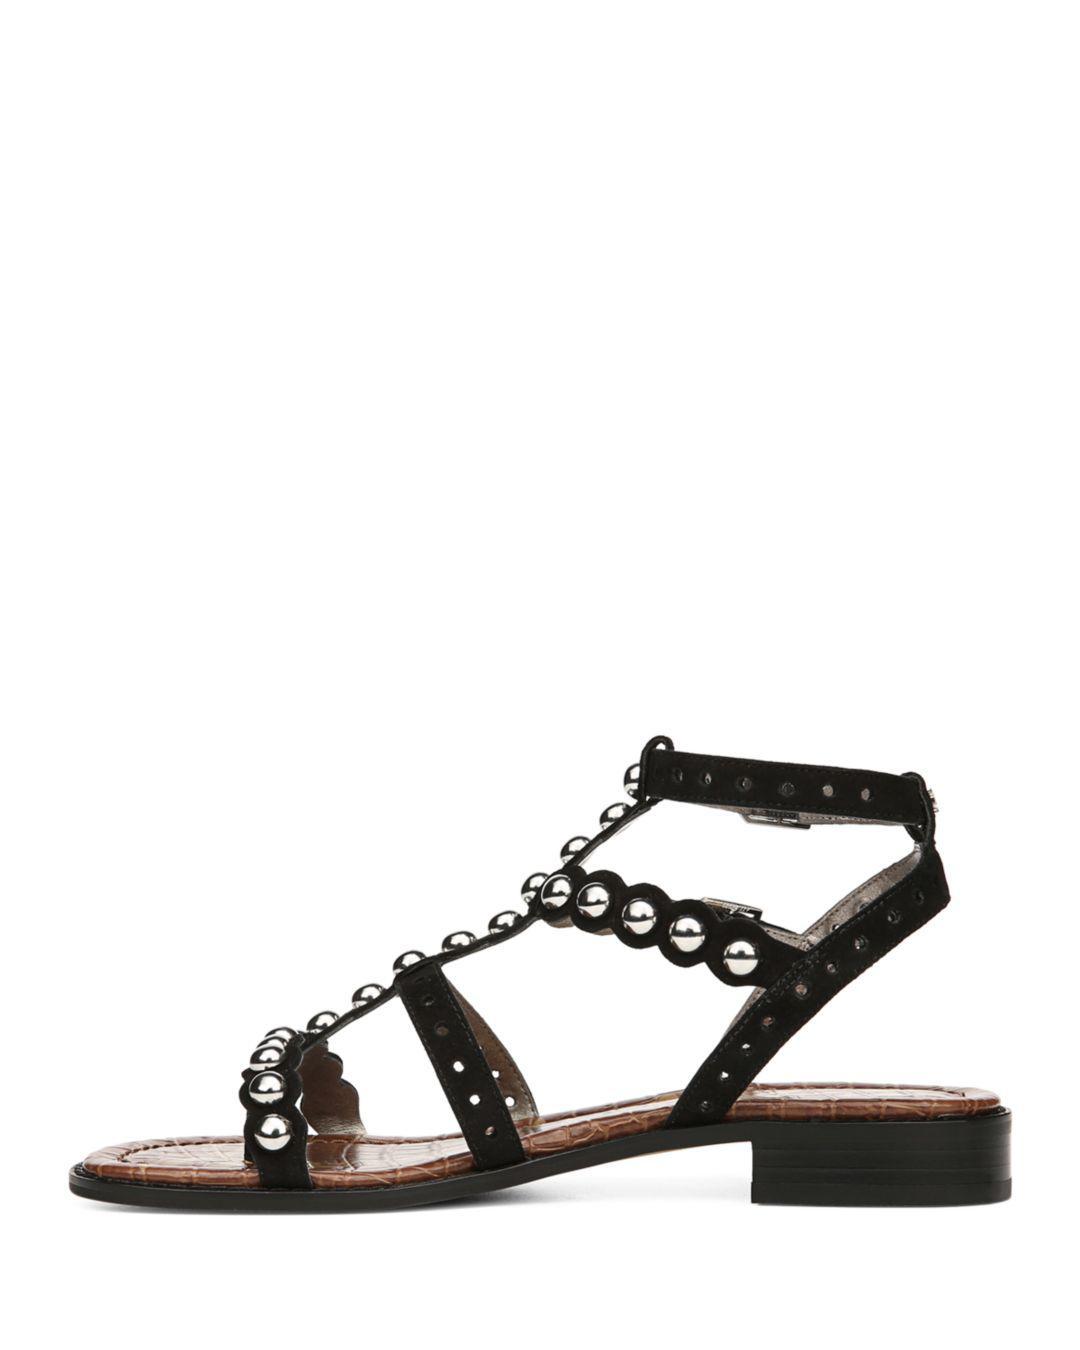 be723f9663aa Sam Edelman Women s Elisa Studded Suede Sandals in Black - Lyst